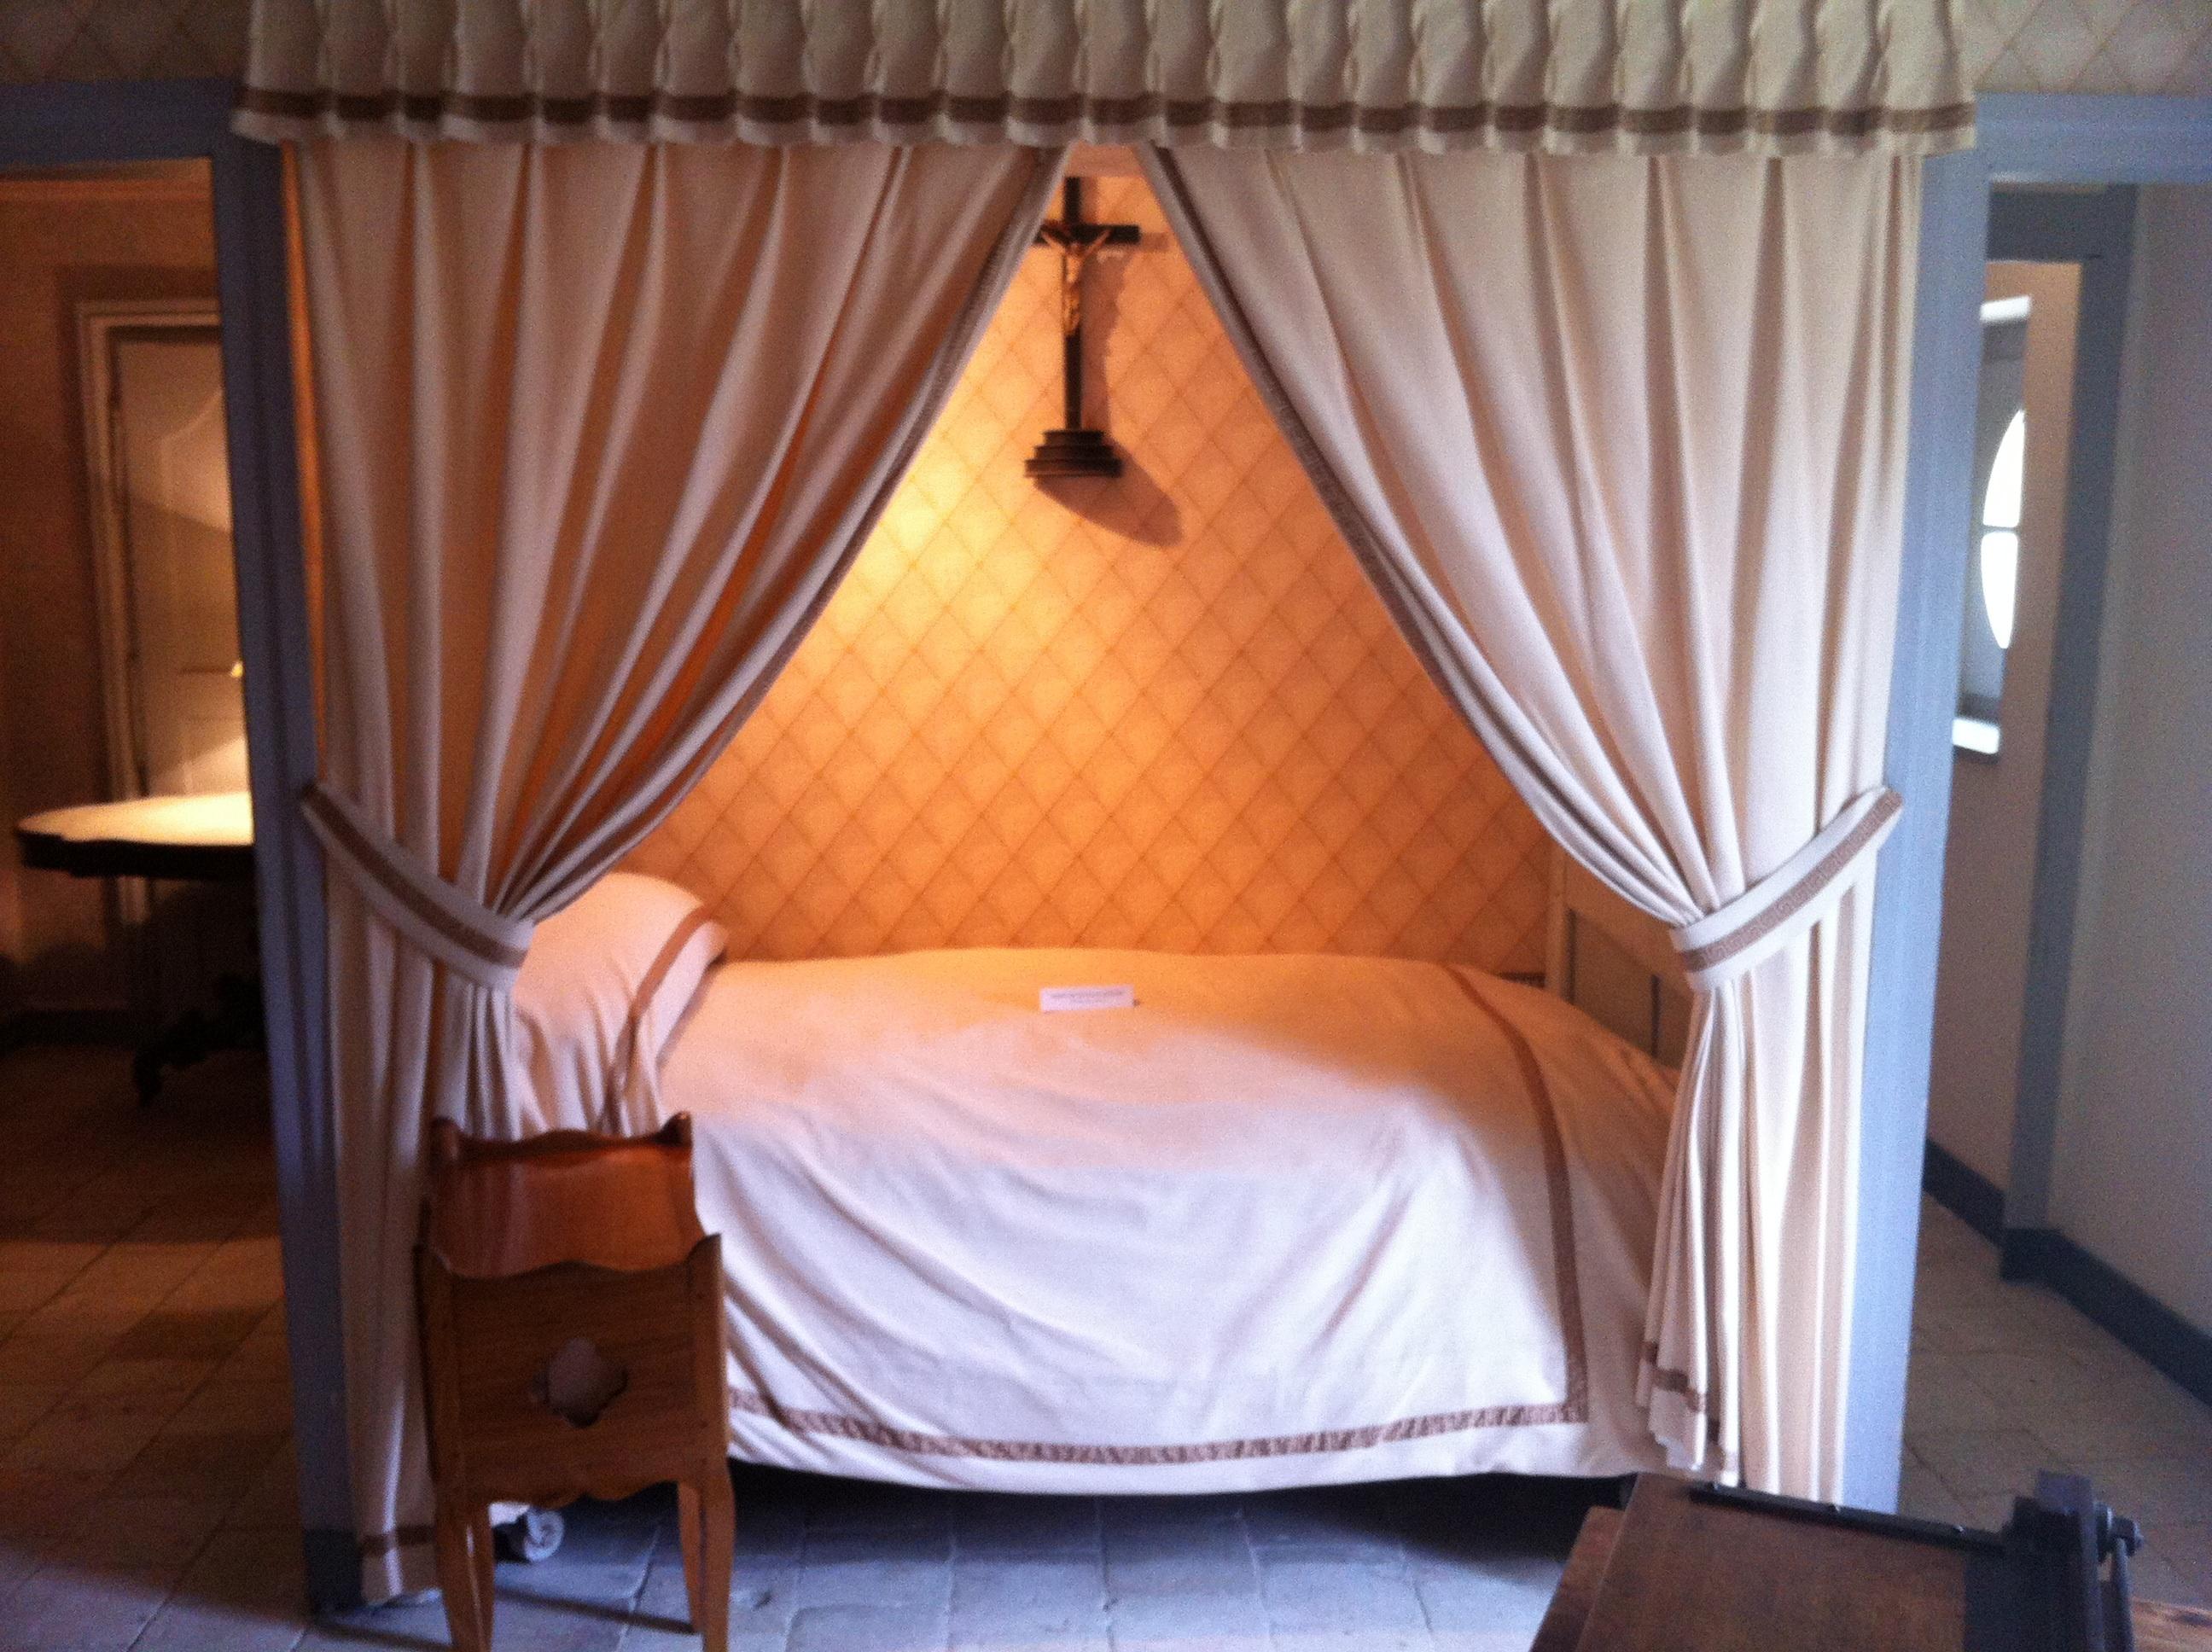 file chambre coucher balzac sach jpg wikimedia commons